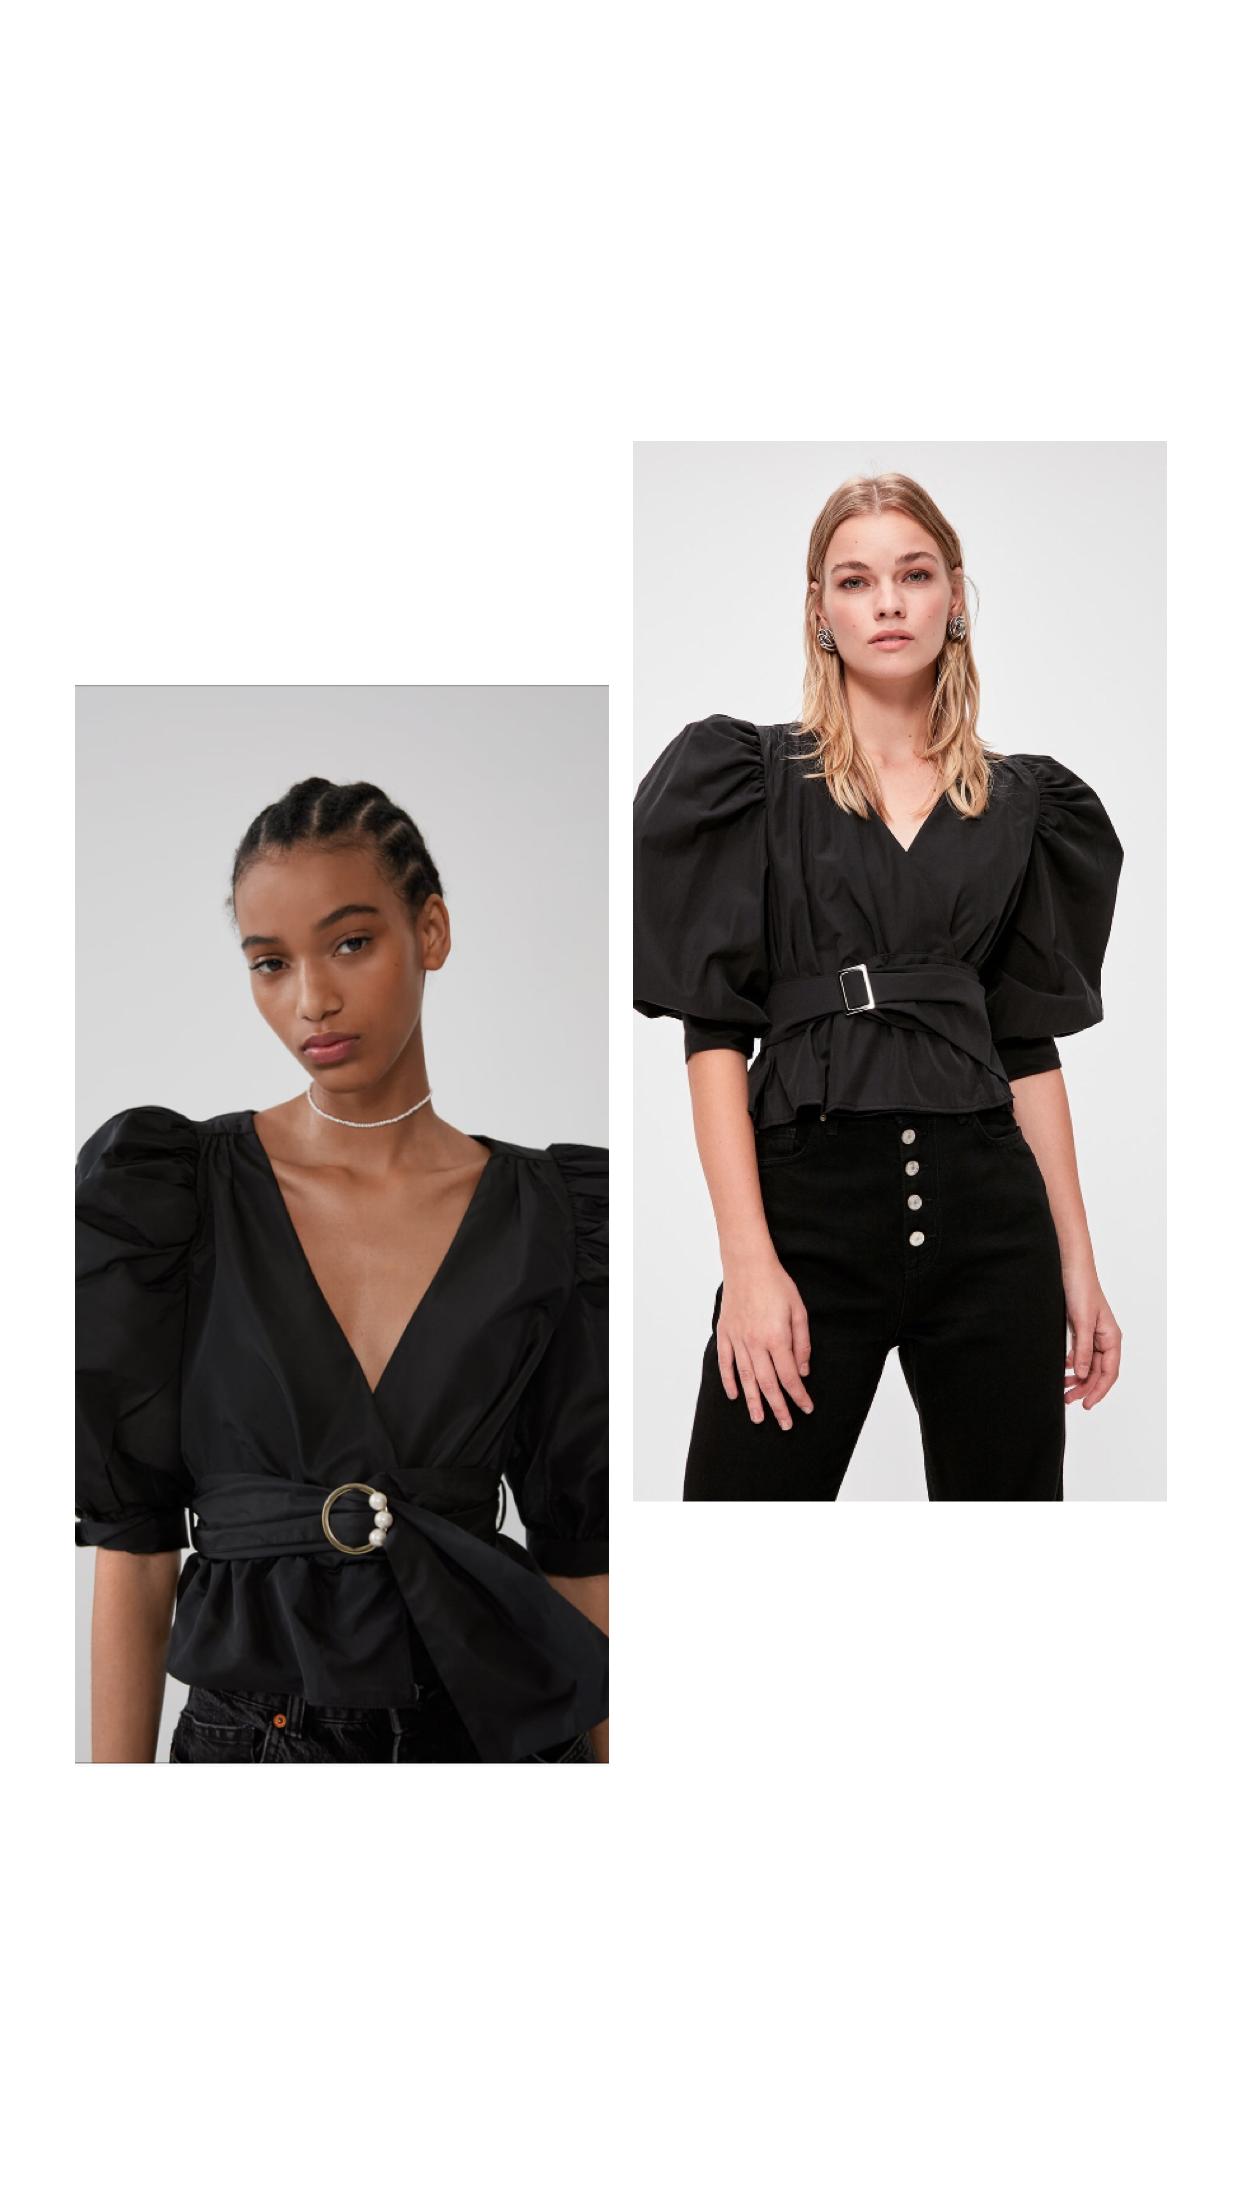 Zara Muadili Bluz Zara Trendler Bluz